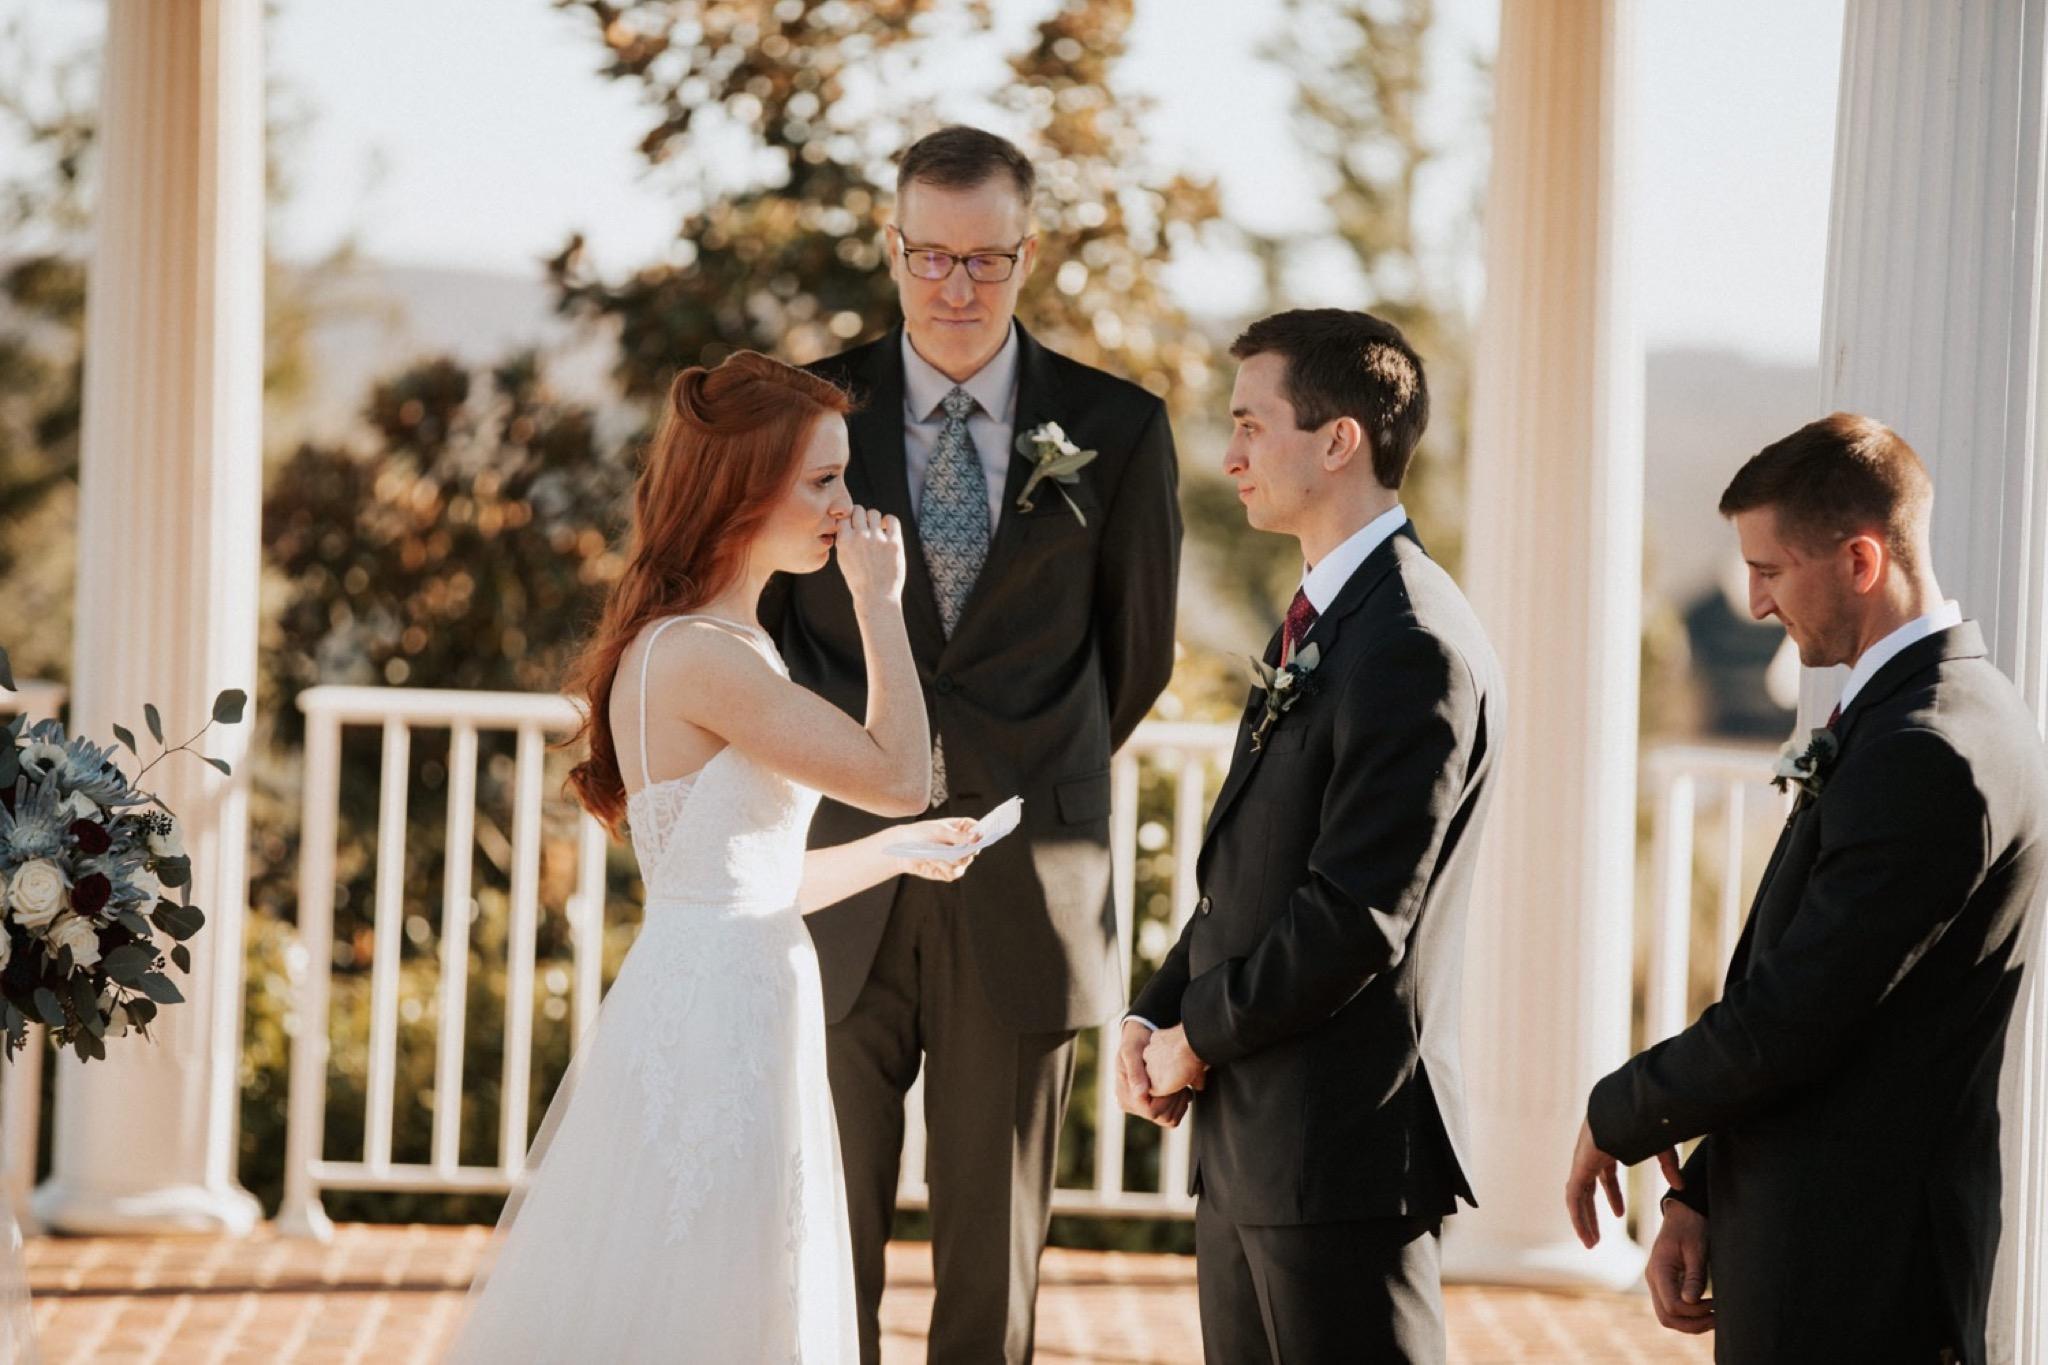 48_West Manor Estate Weddings - Pat Cori Photography-102_Ceremony_VirginiaWeddingPhotographer_PatCoriPhotography_WestManorEstate_Wedding.jpg